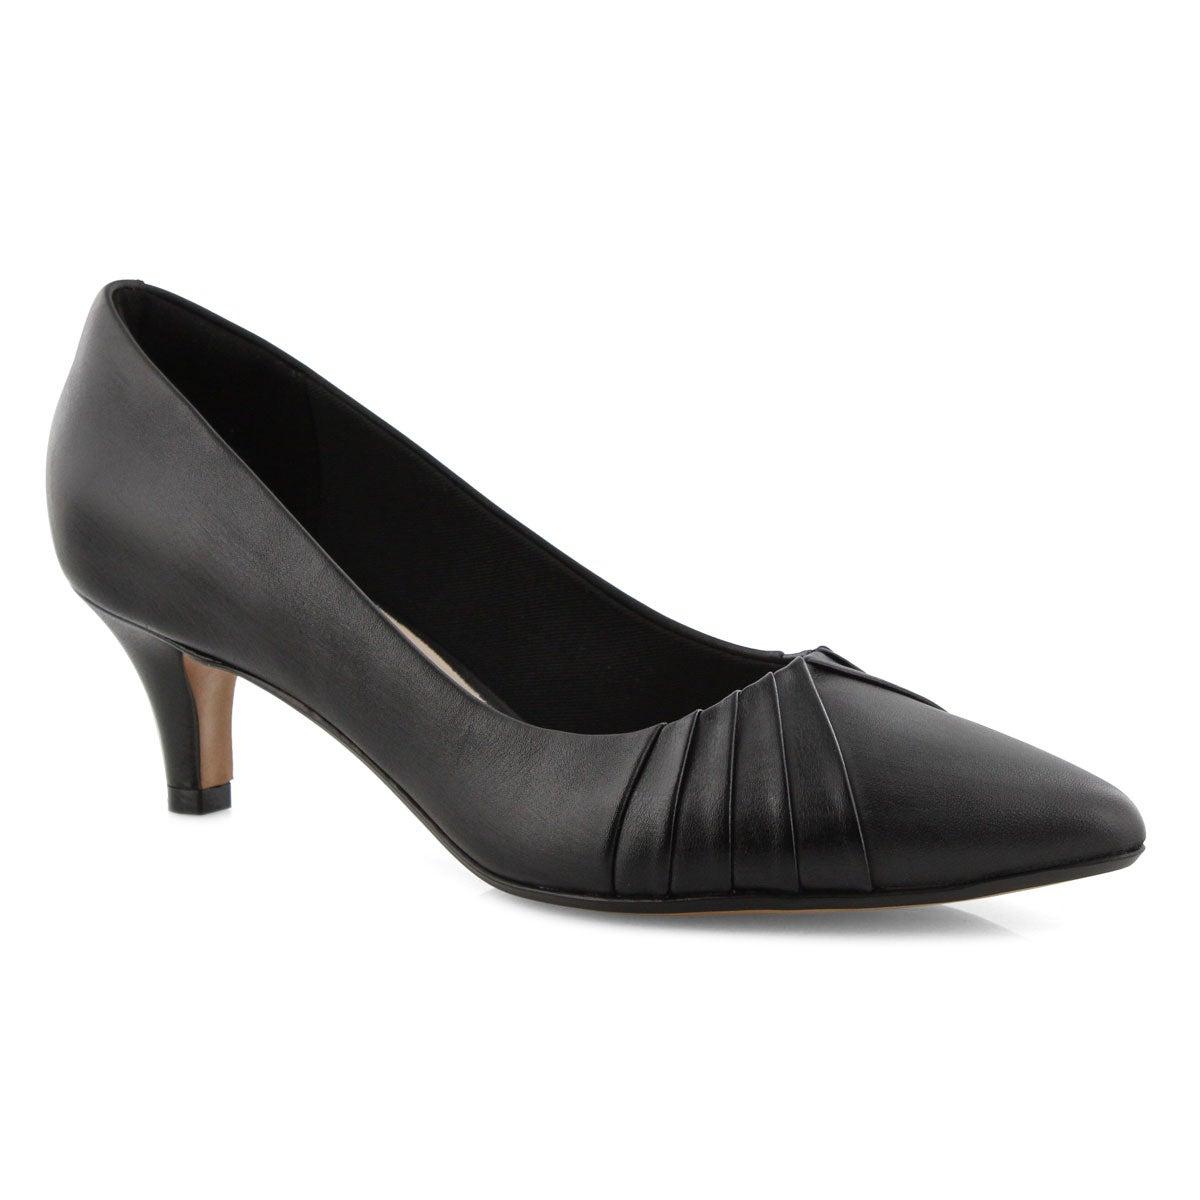 Lds Linvale Crown blk dress heel